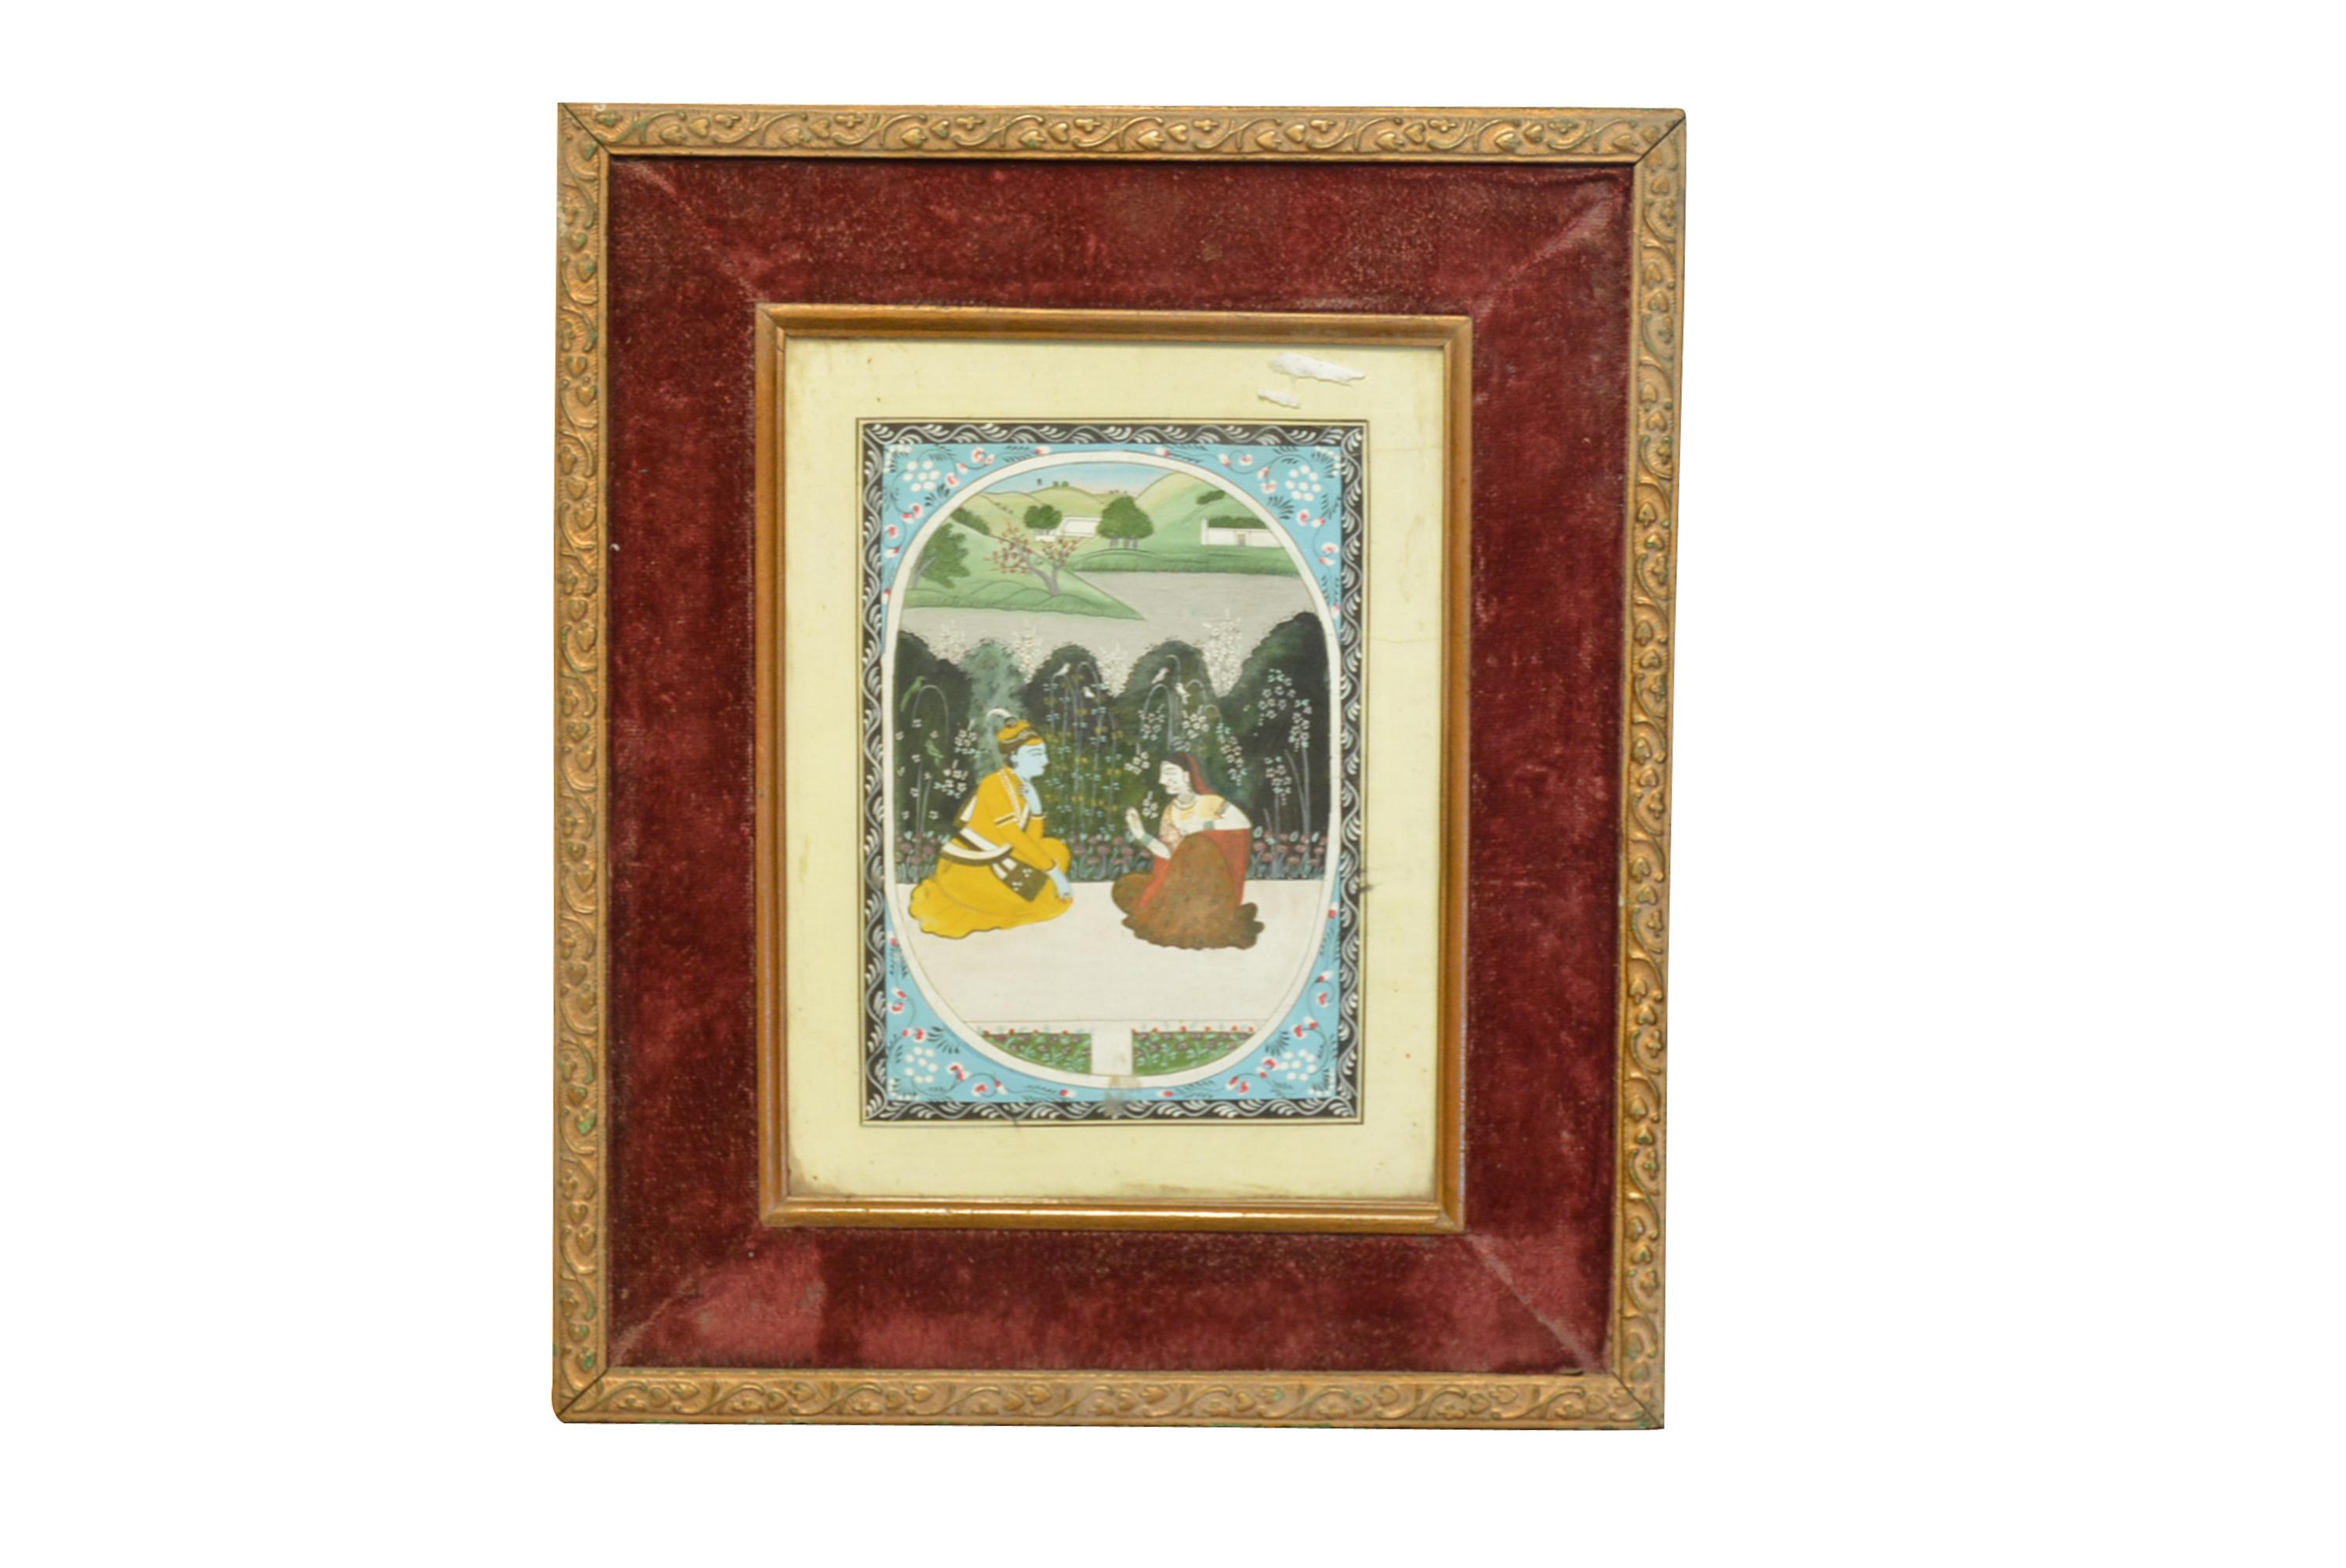 ANRA15109 - 25 x 25 x 35 cm